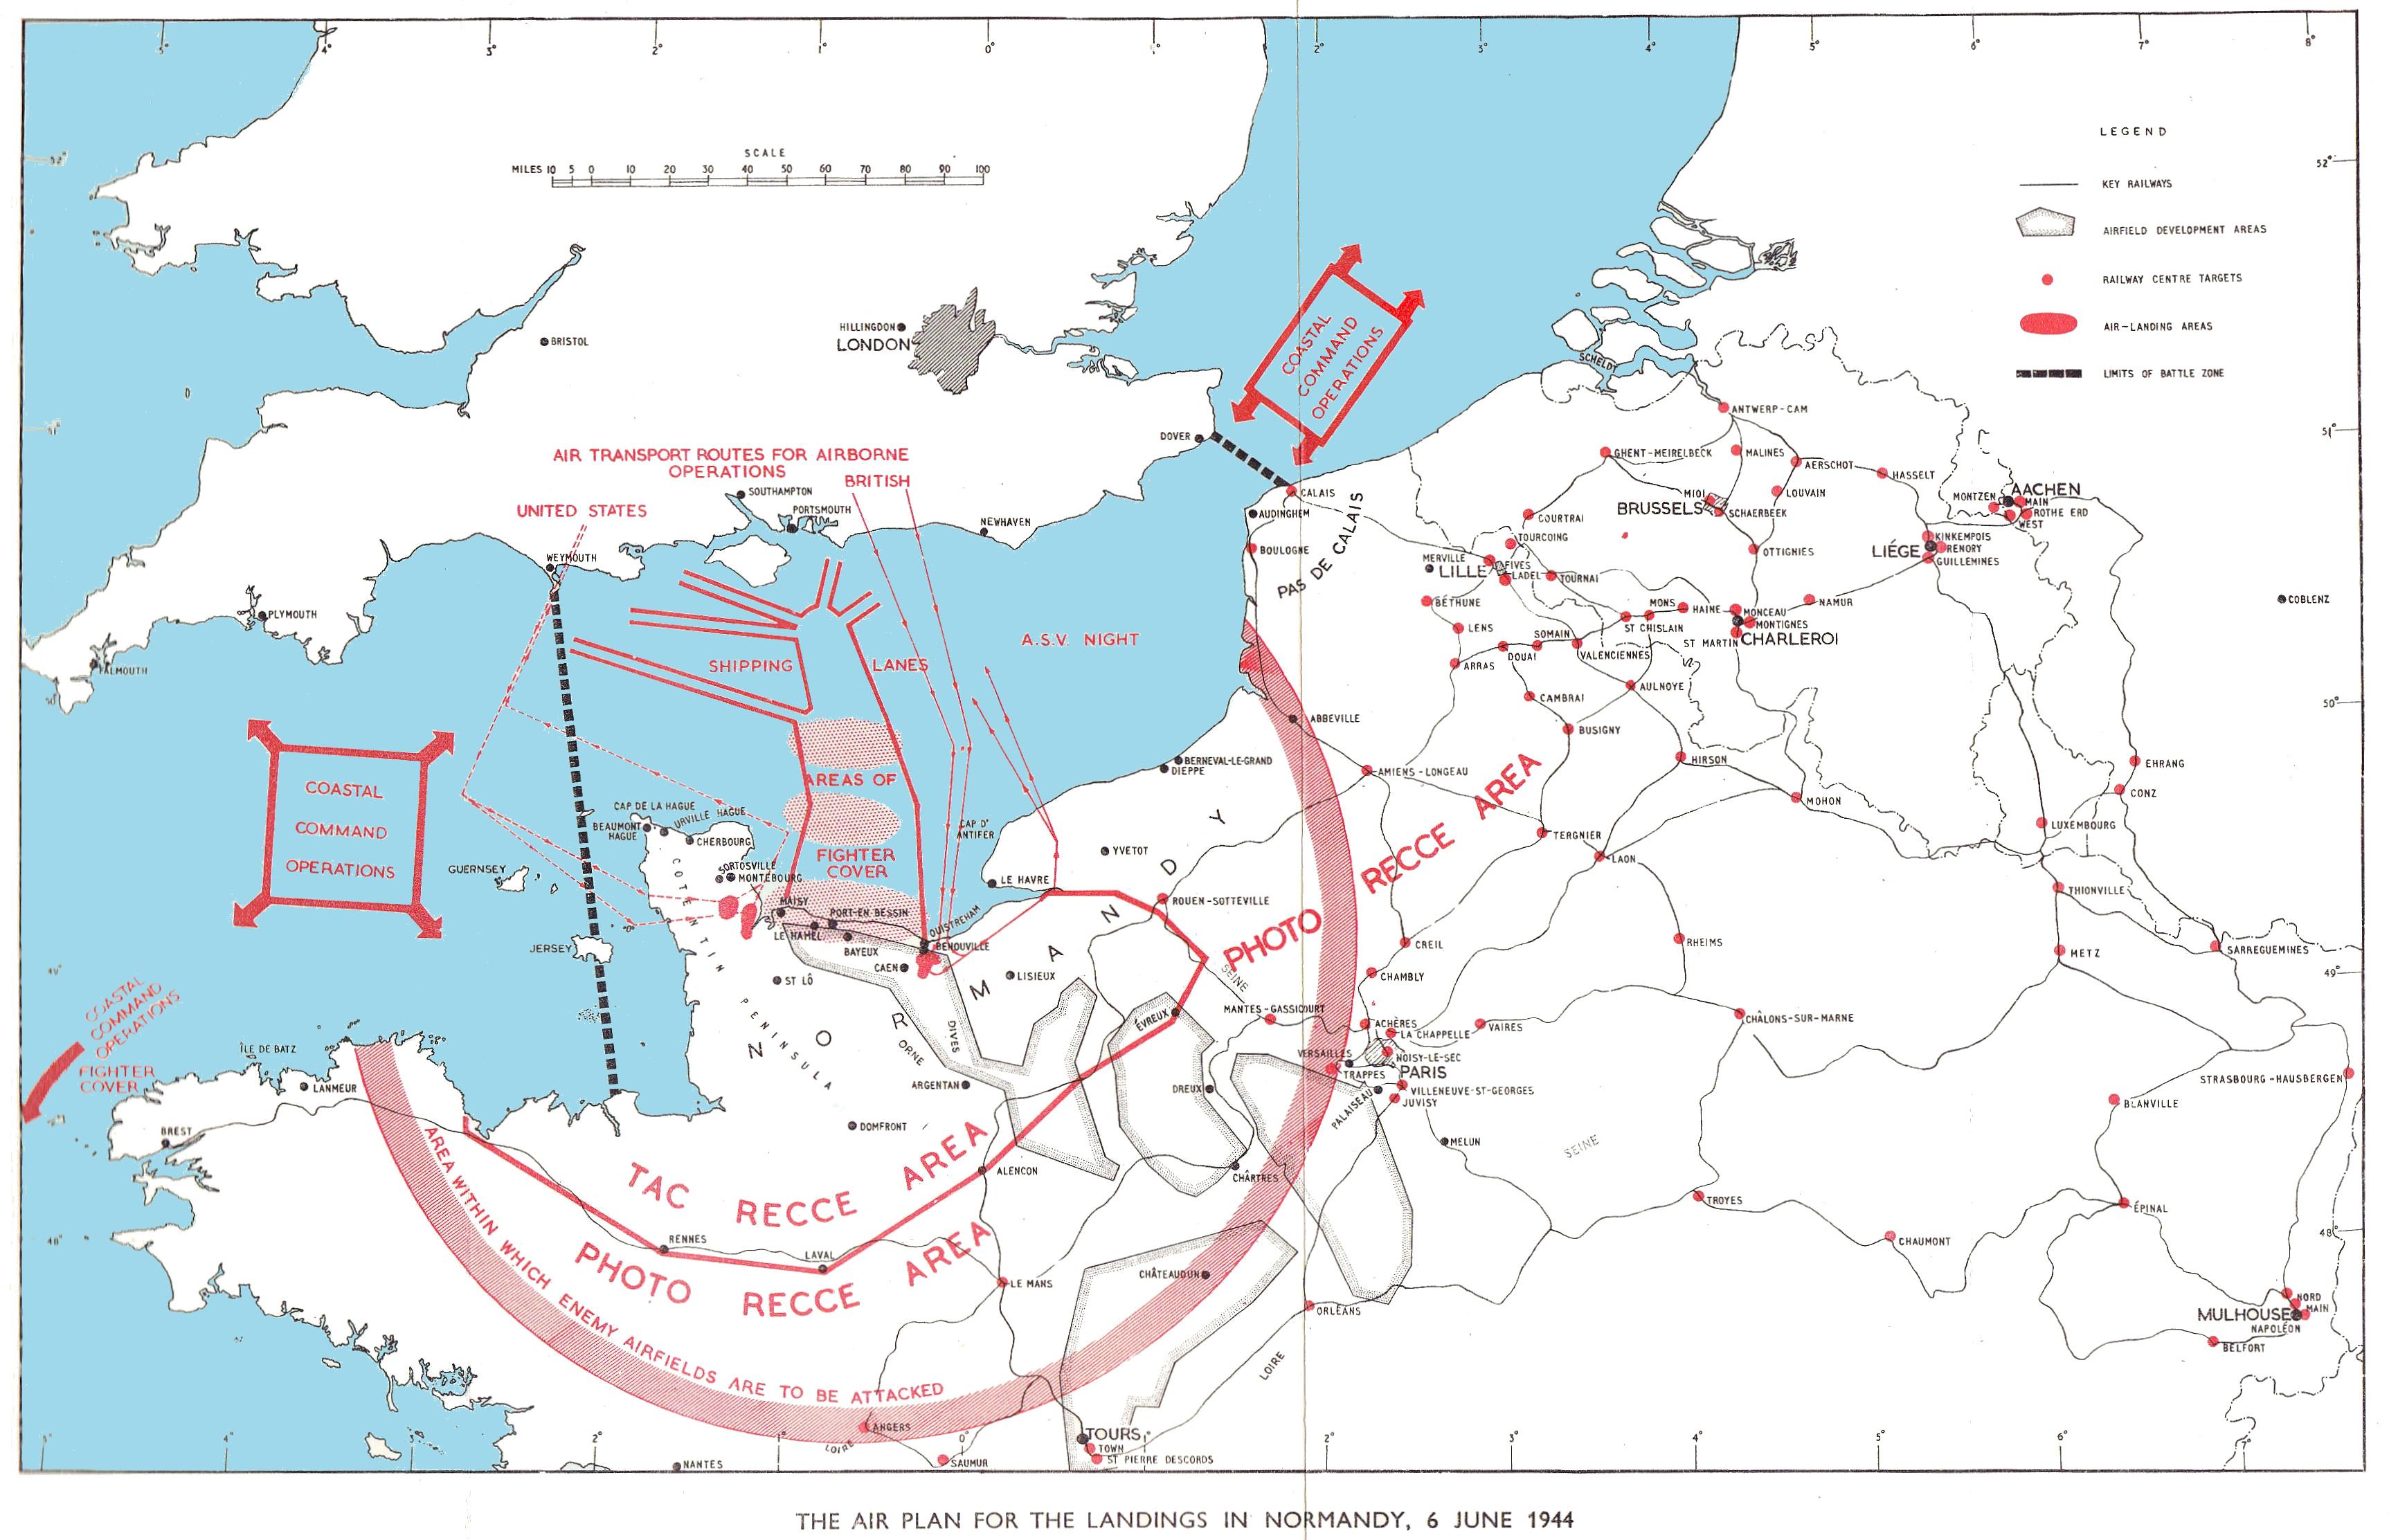 FileAir plan for landings in Normandy June 1944jpg Wikimedia Commons